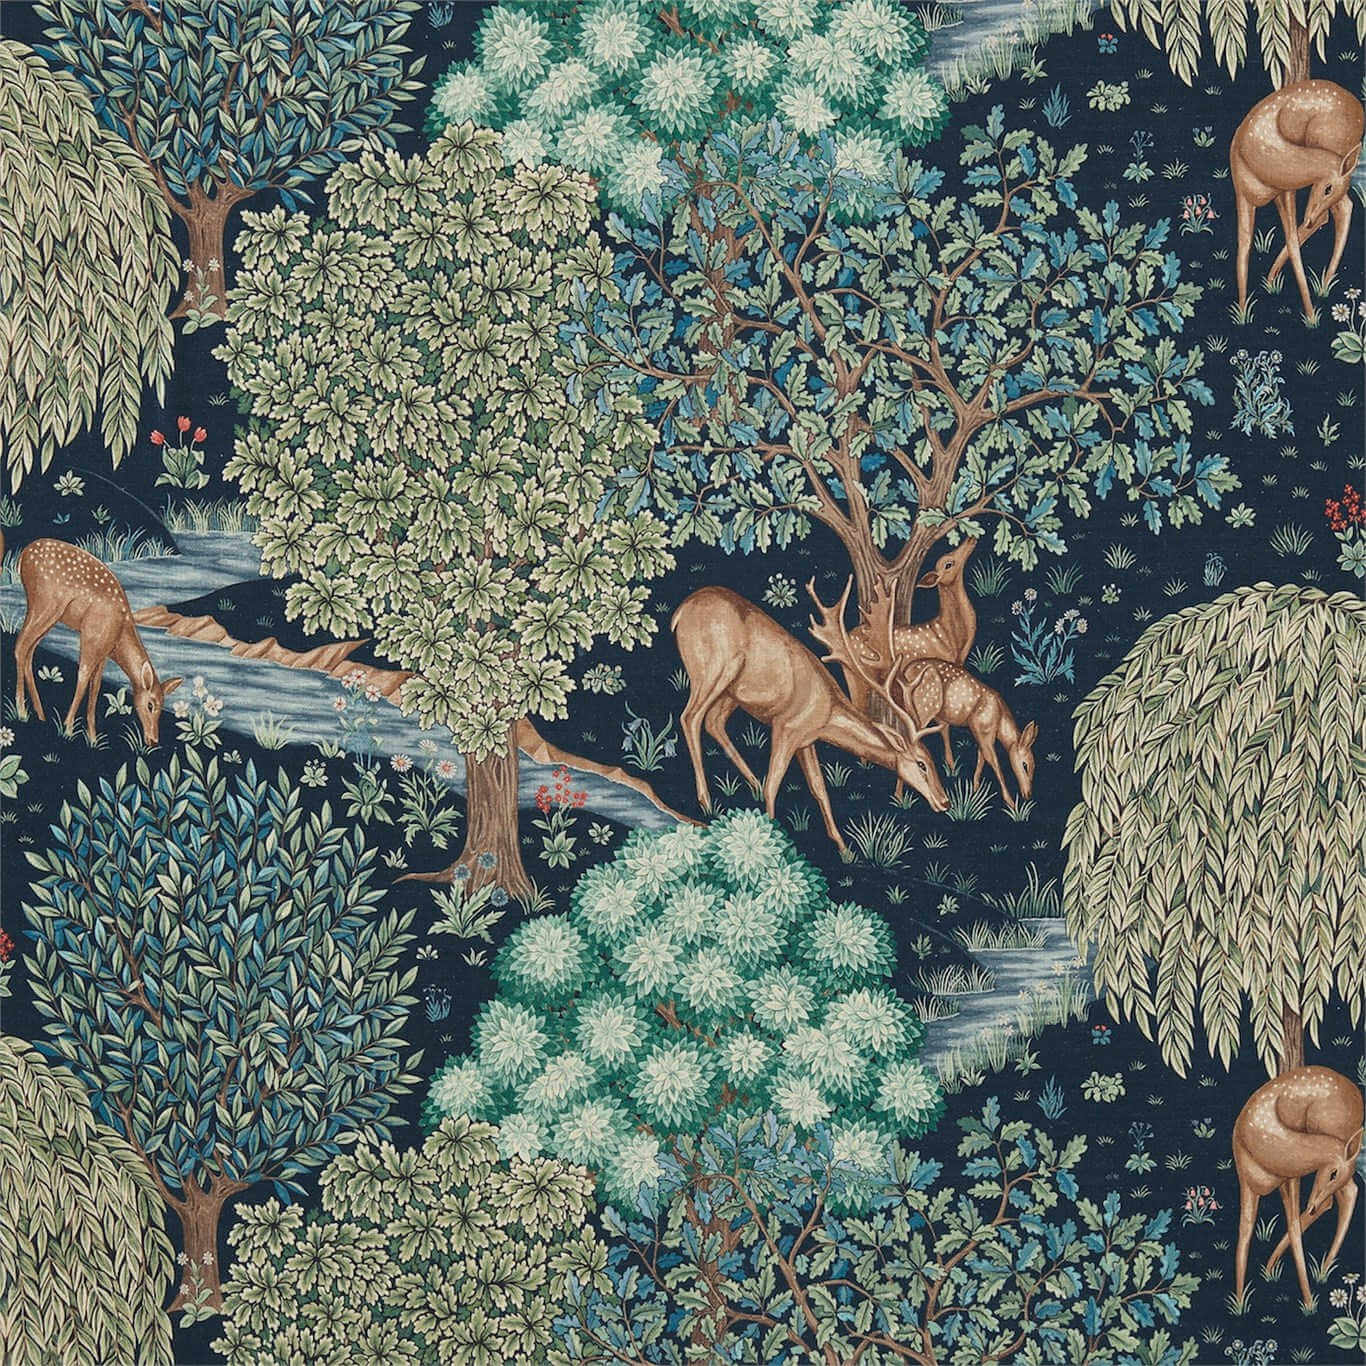 ilustracion de animales arts & crafts de william morris